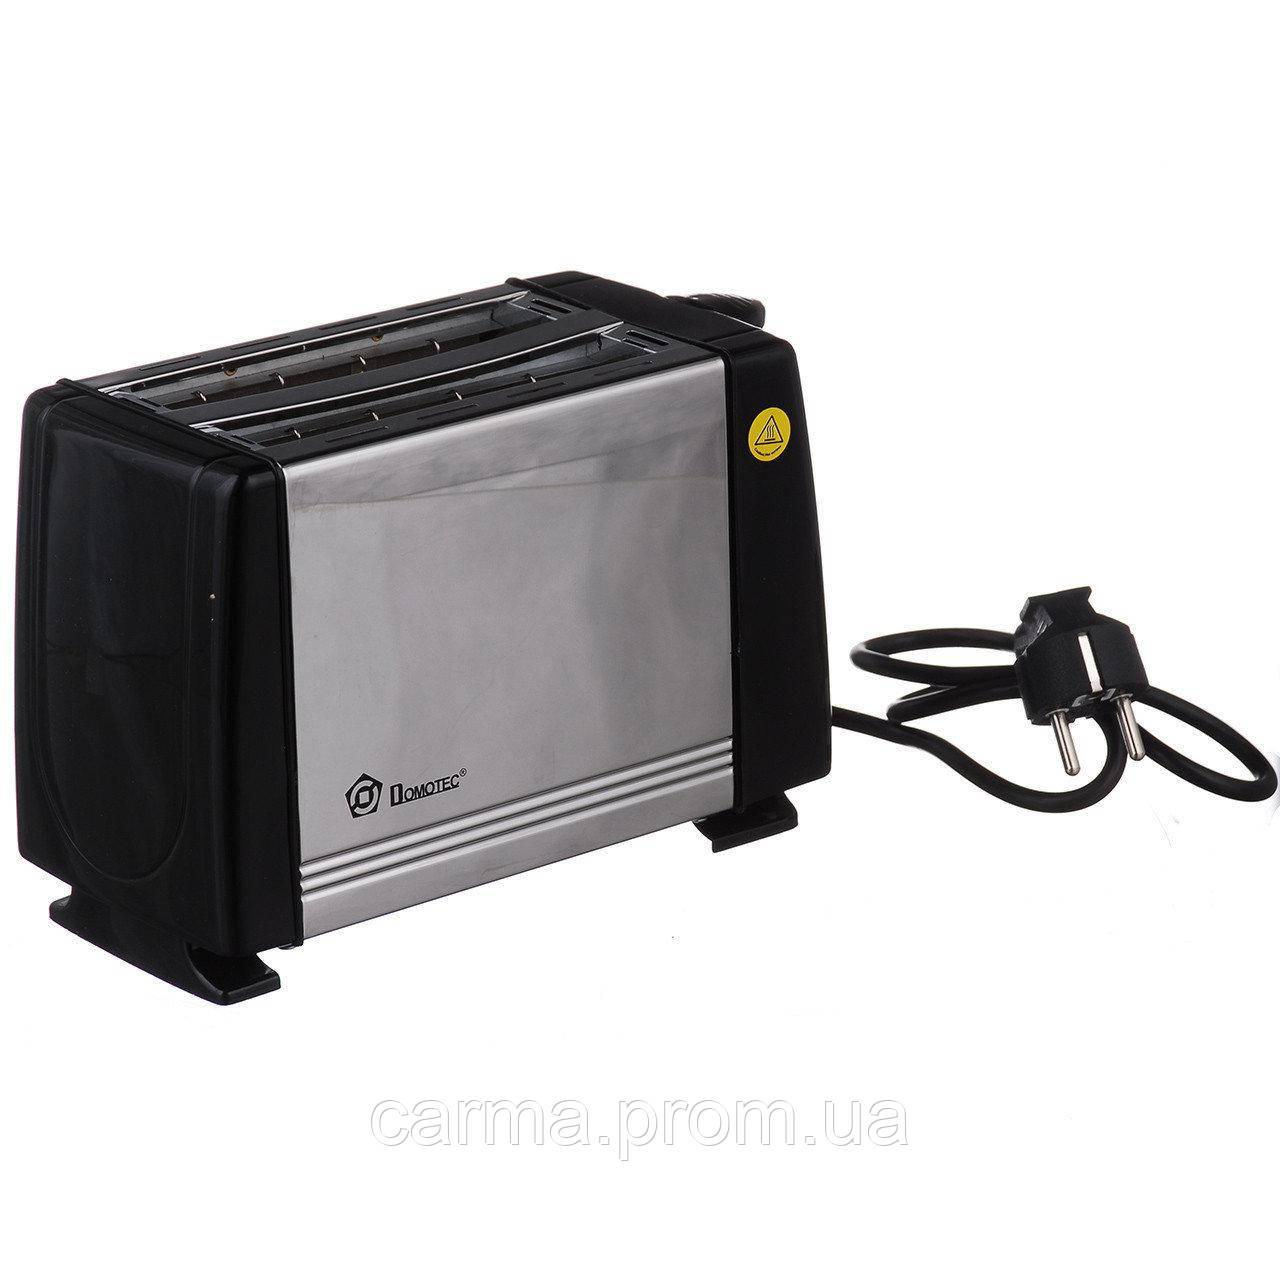 Тостер Domotec MS-3231 Black Steel